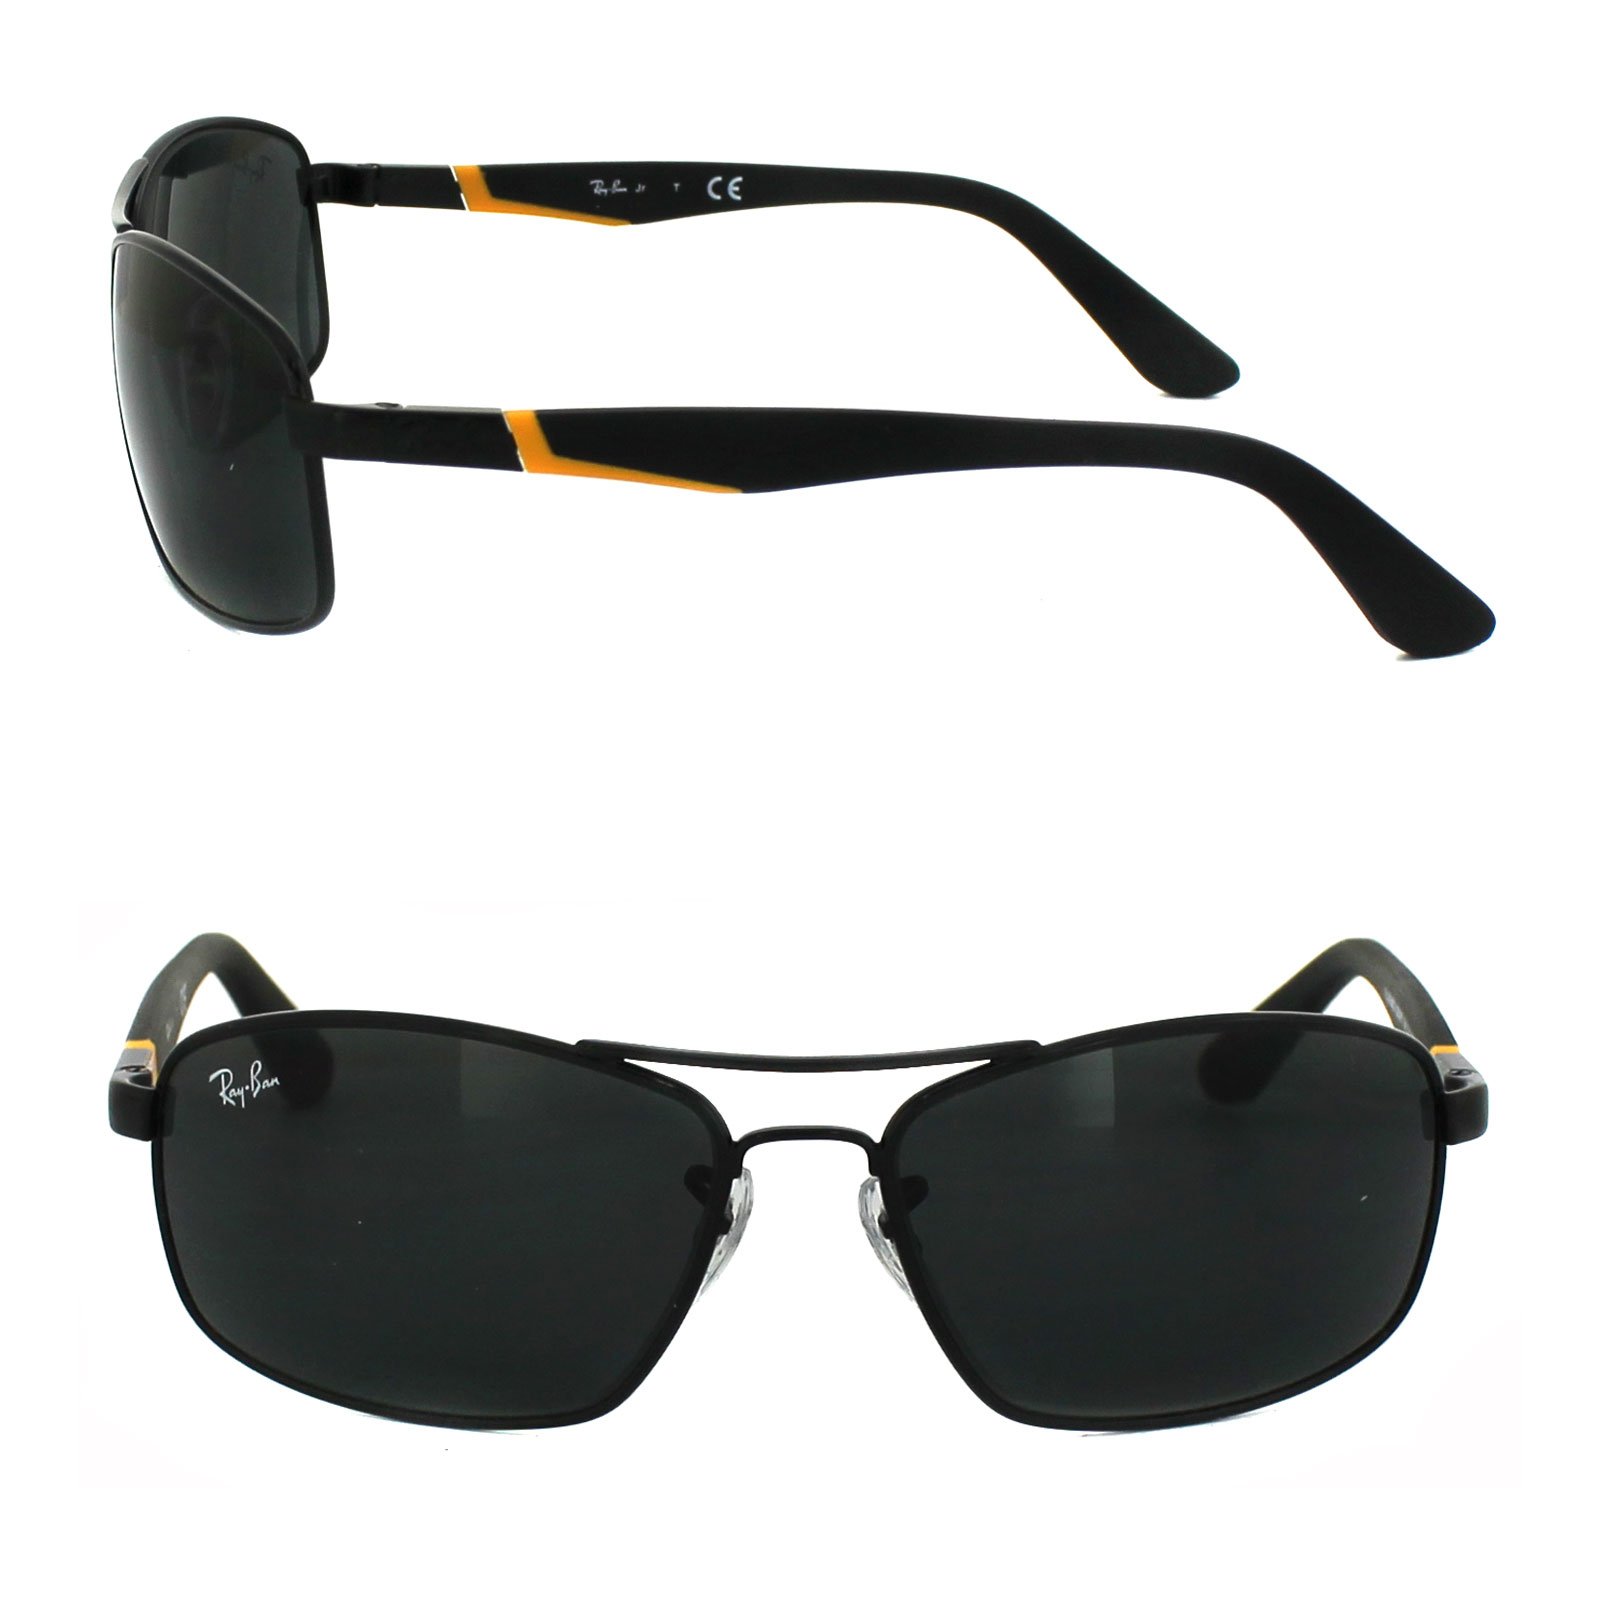 30759590a5 Cheap Ray-Ban Junior 9536 Sunglasses - Discounted Sunglasses